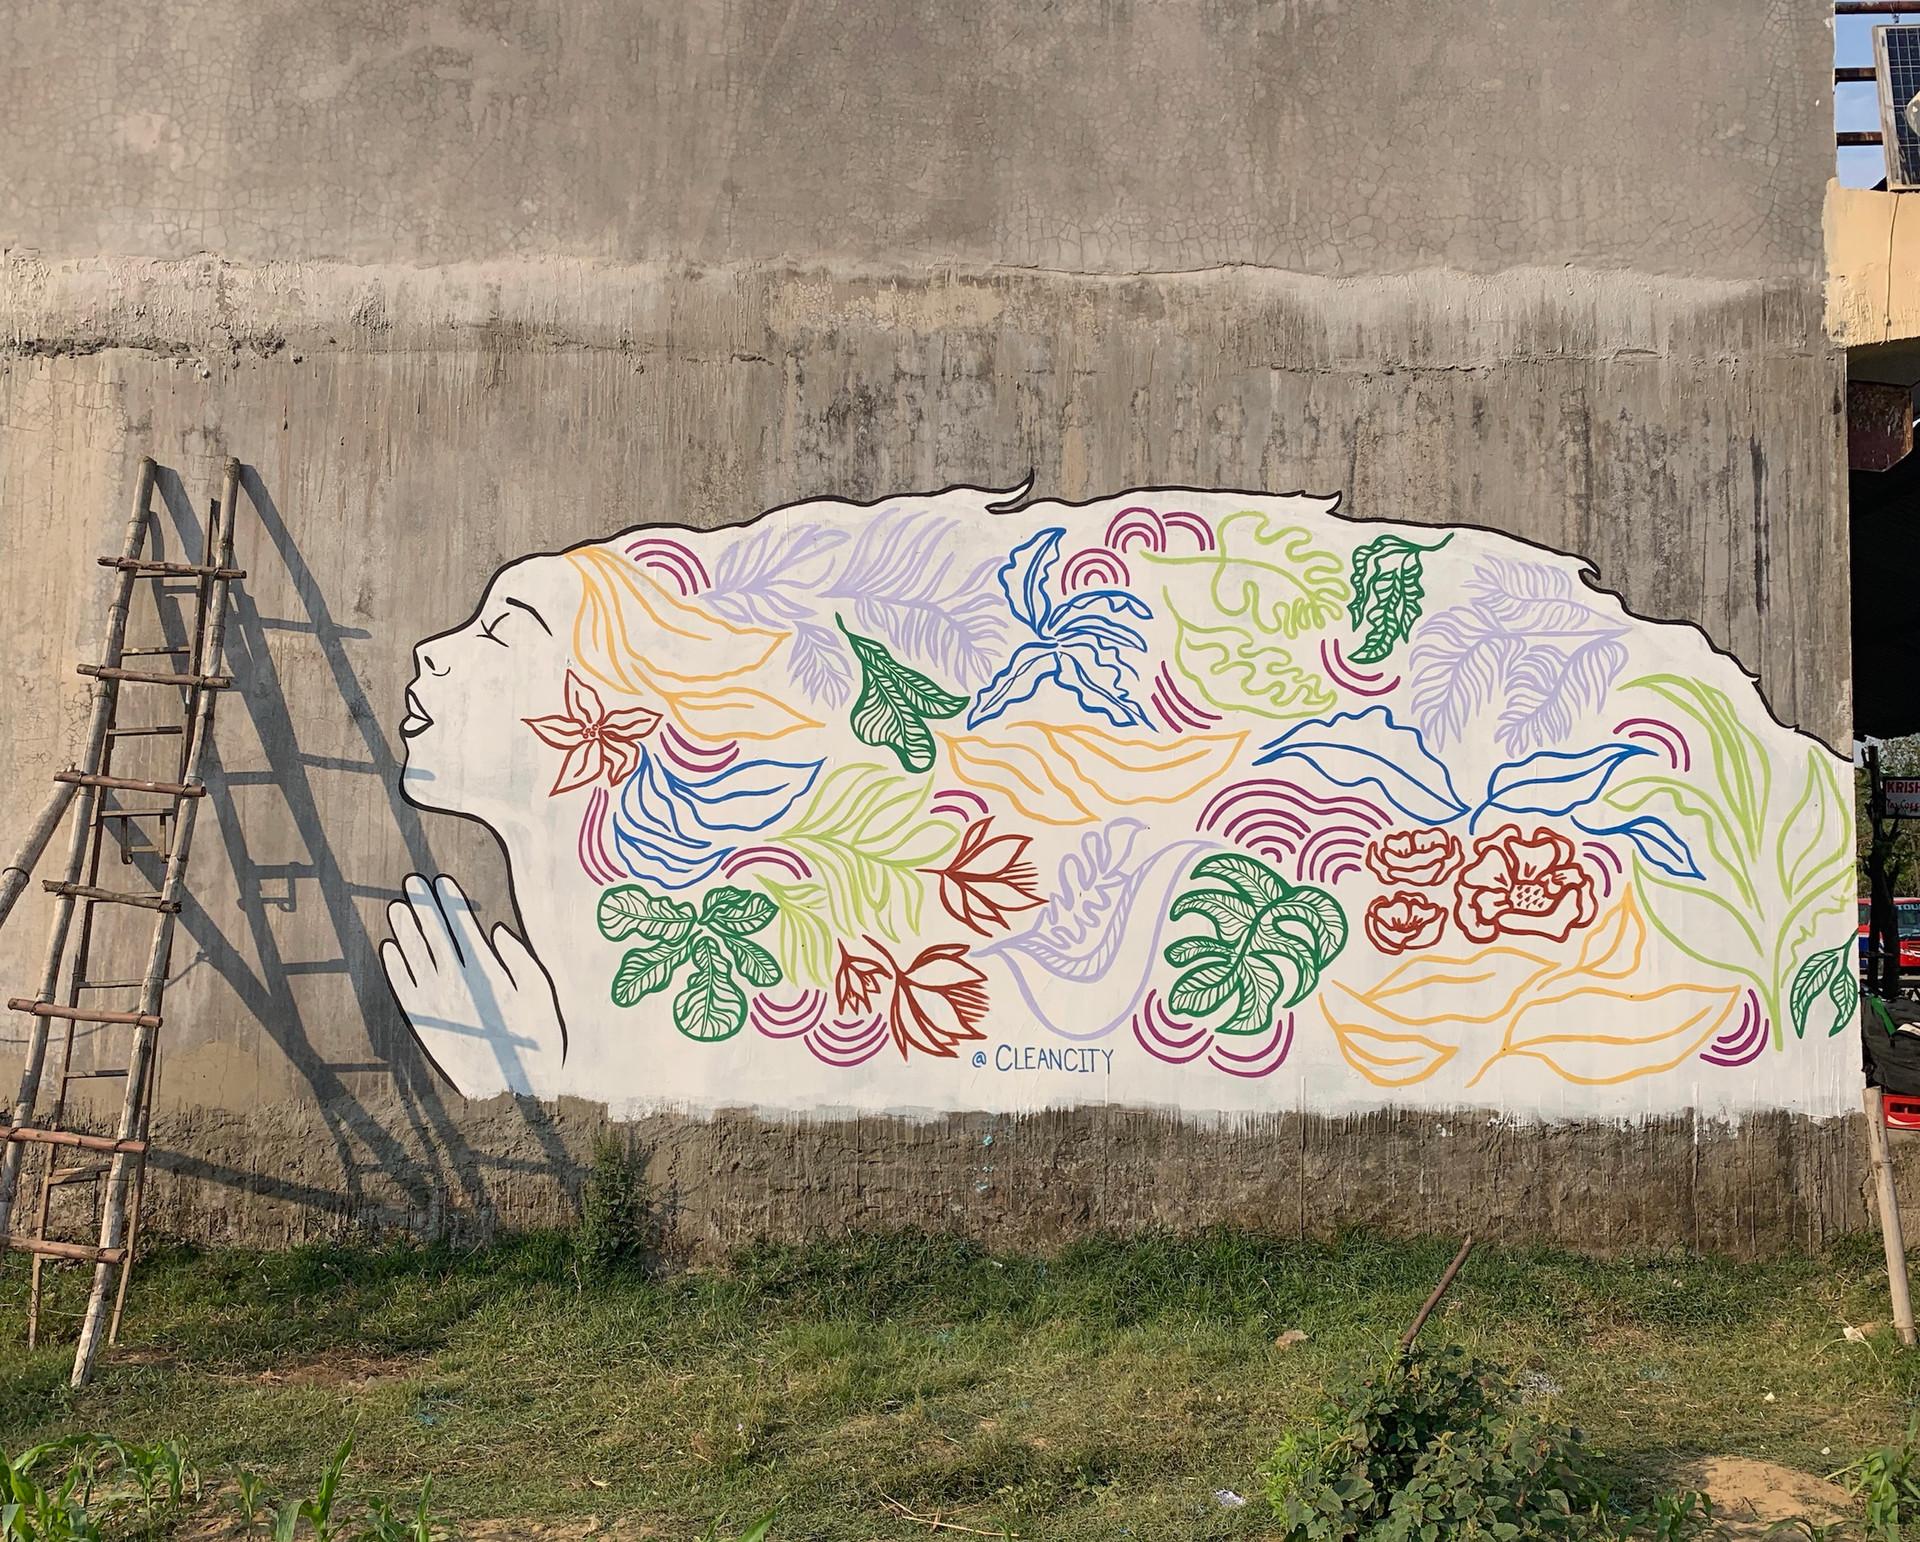 Clean City Mural